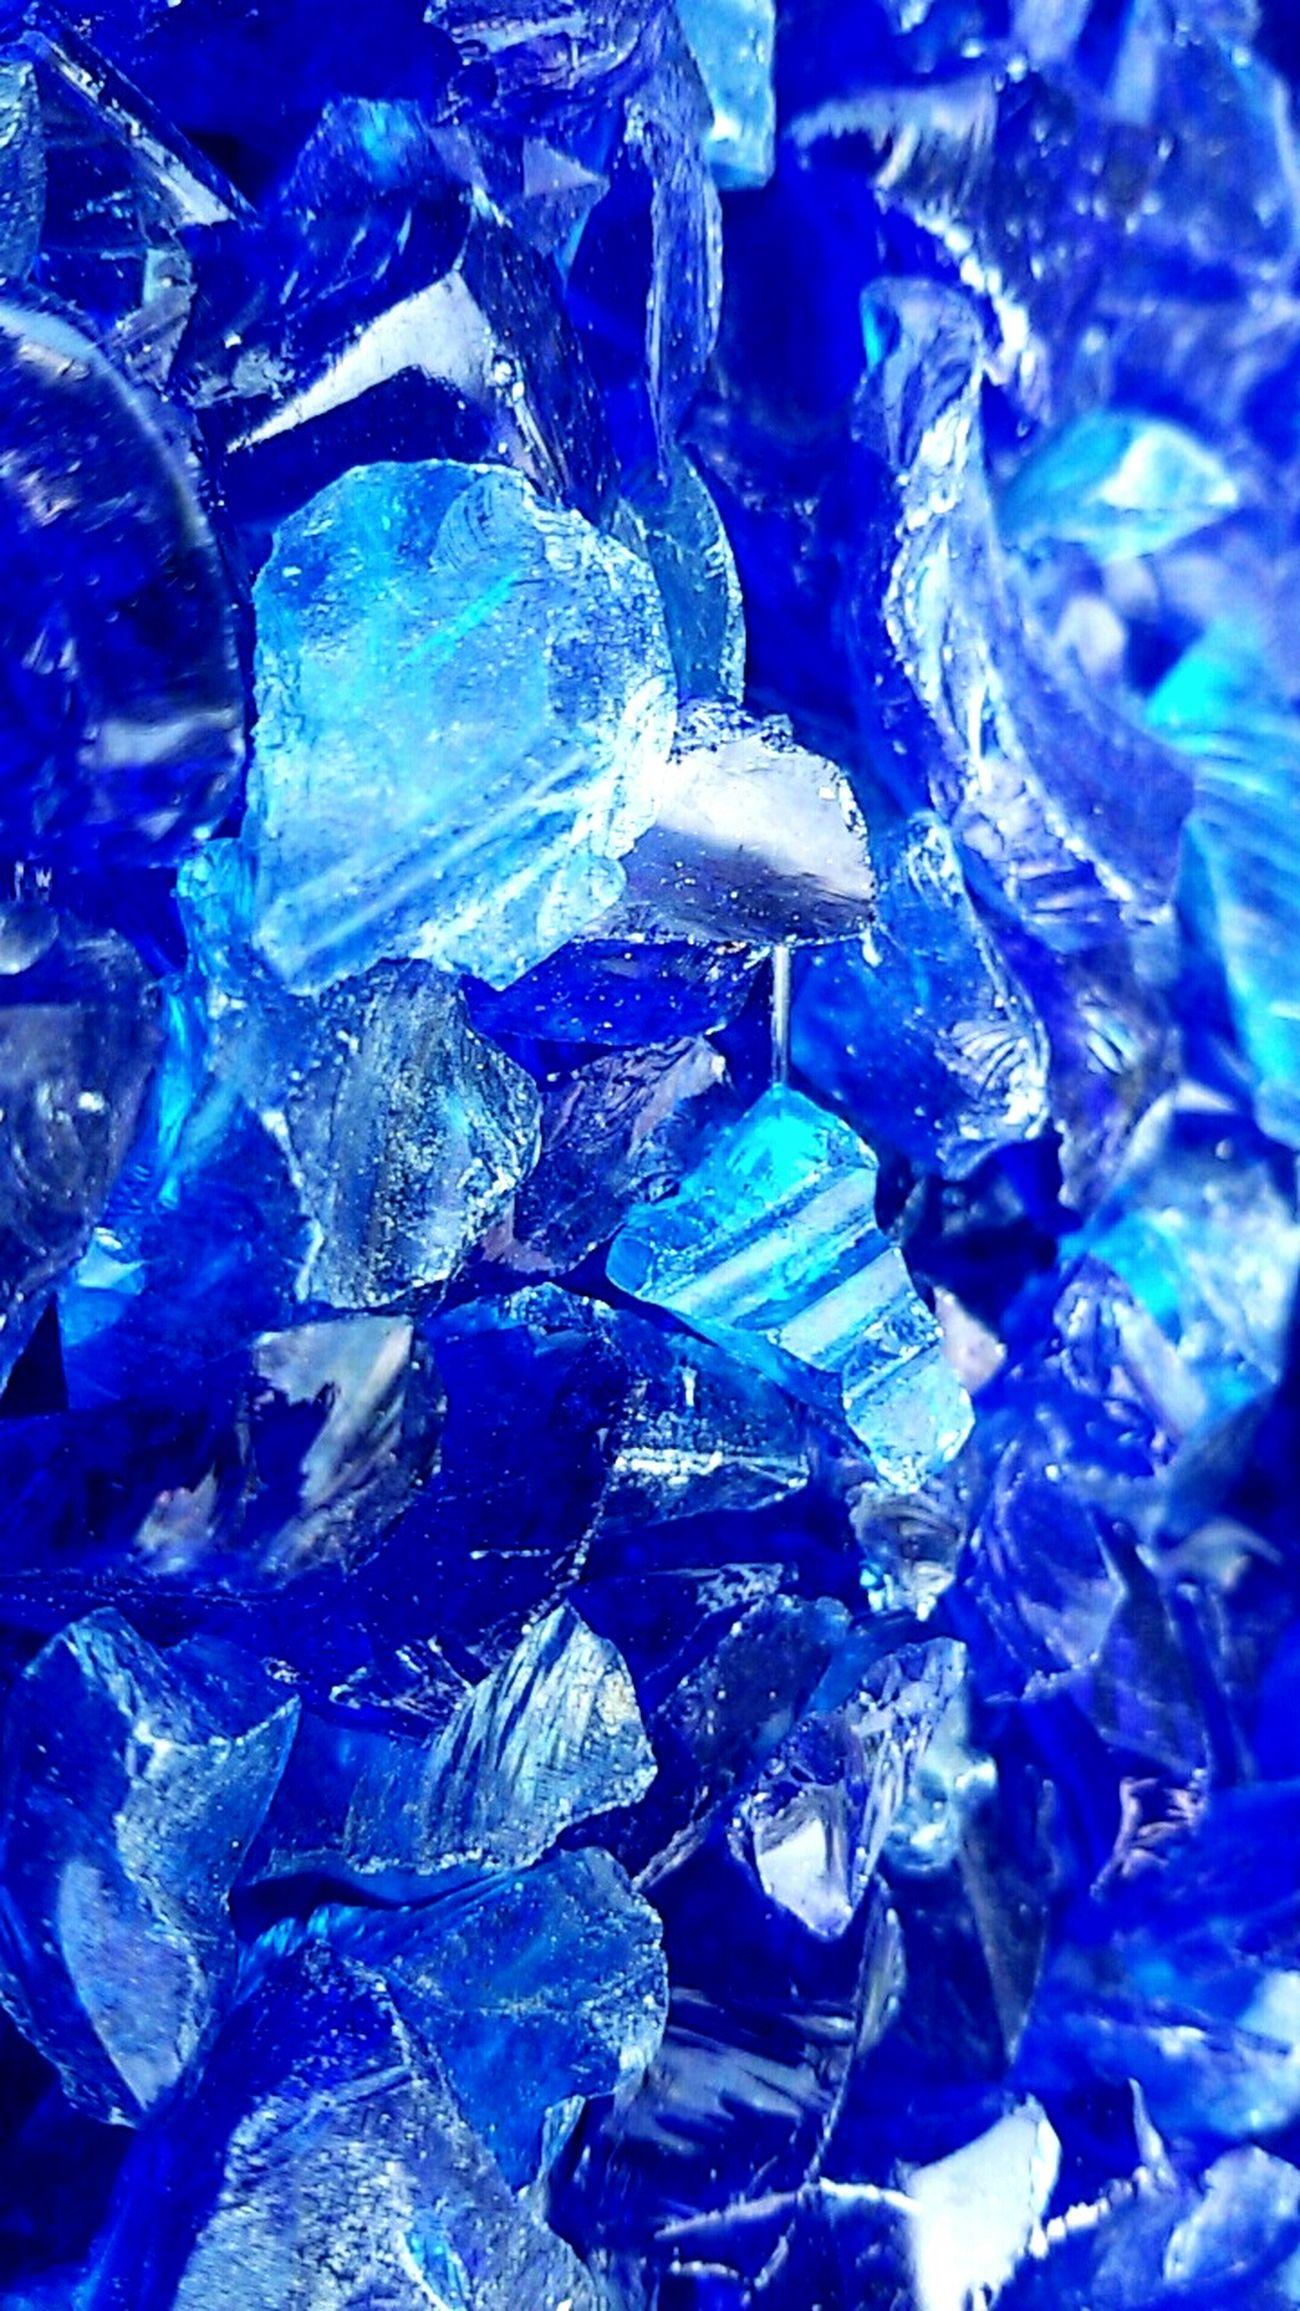 Cristal Crystalized Beautiful ♥